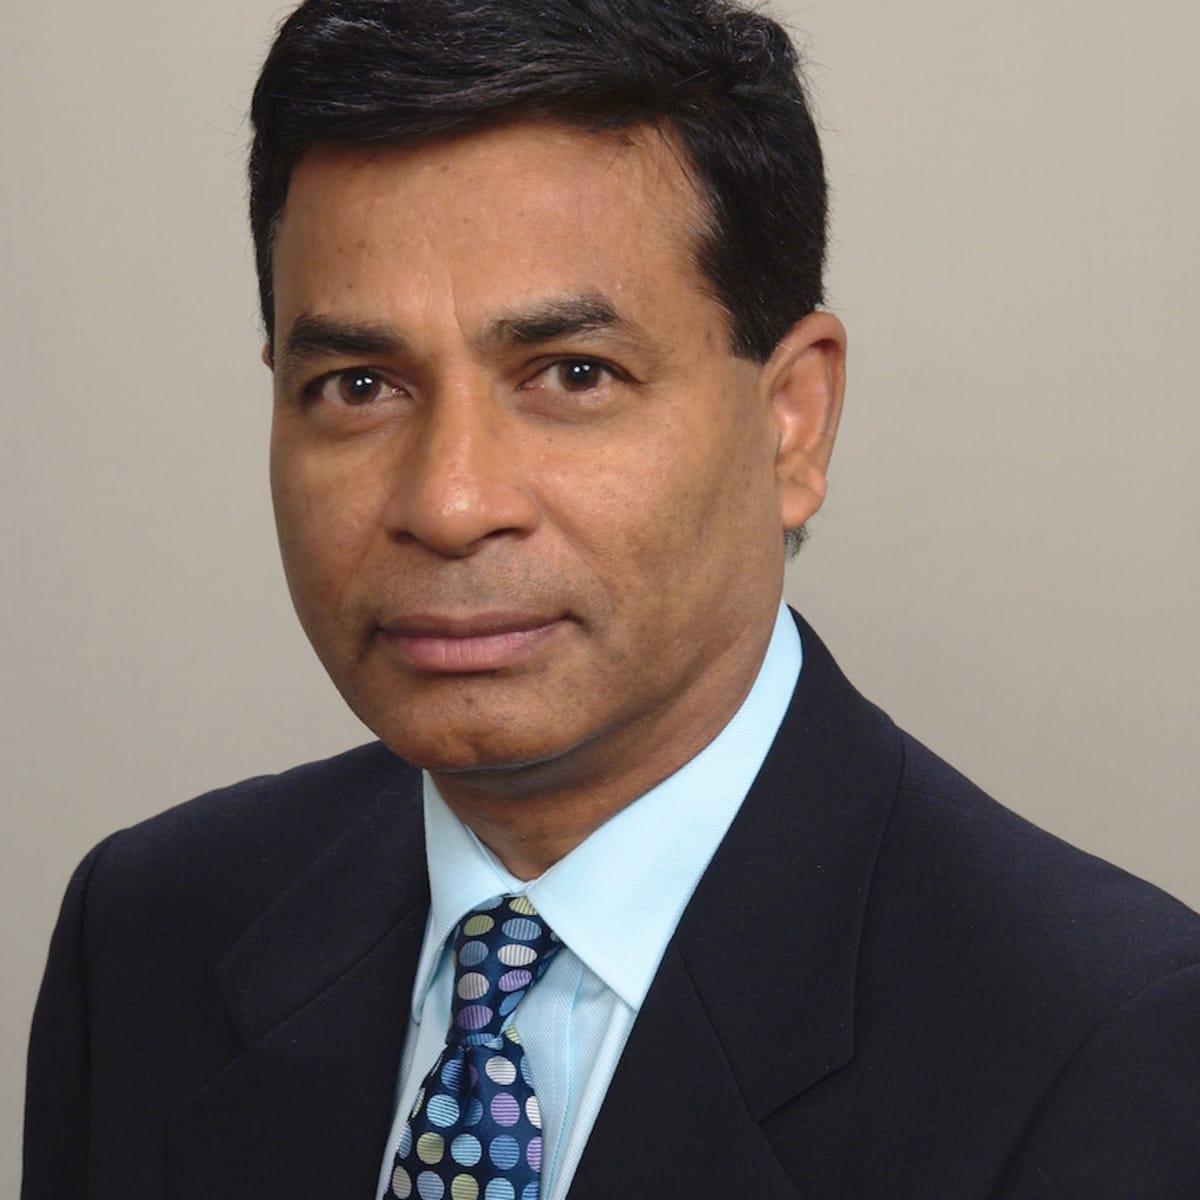 dr shushovan chakrabortty md lake orion mi anesthesiologist